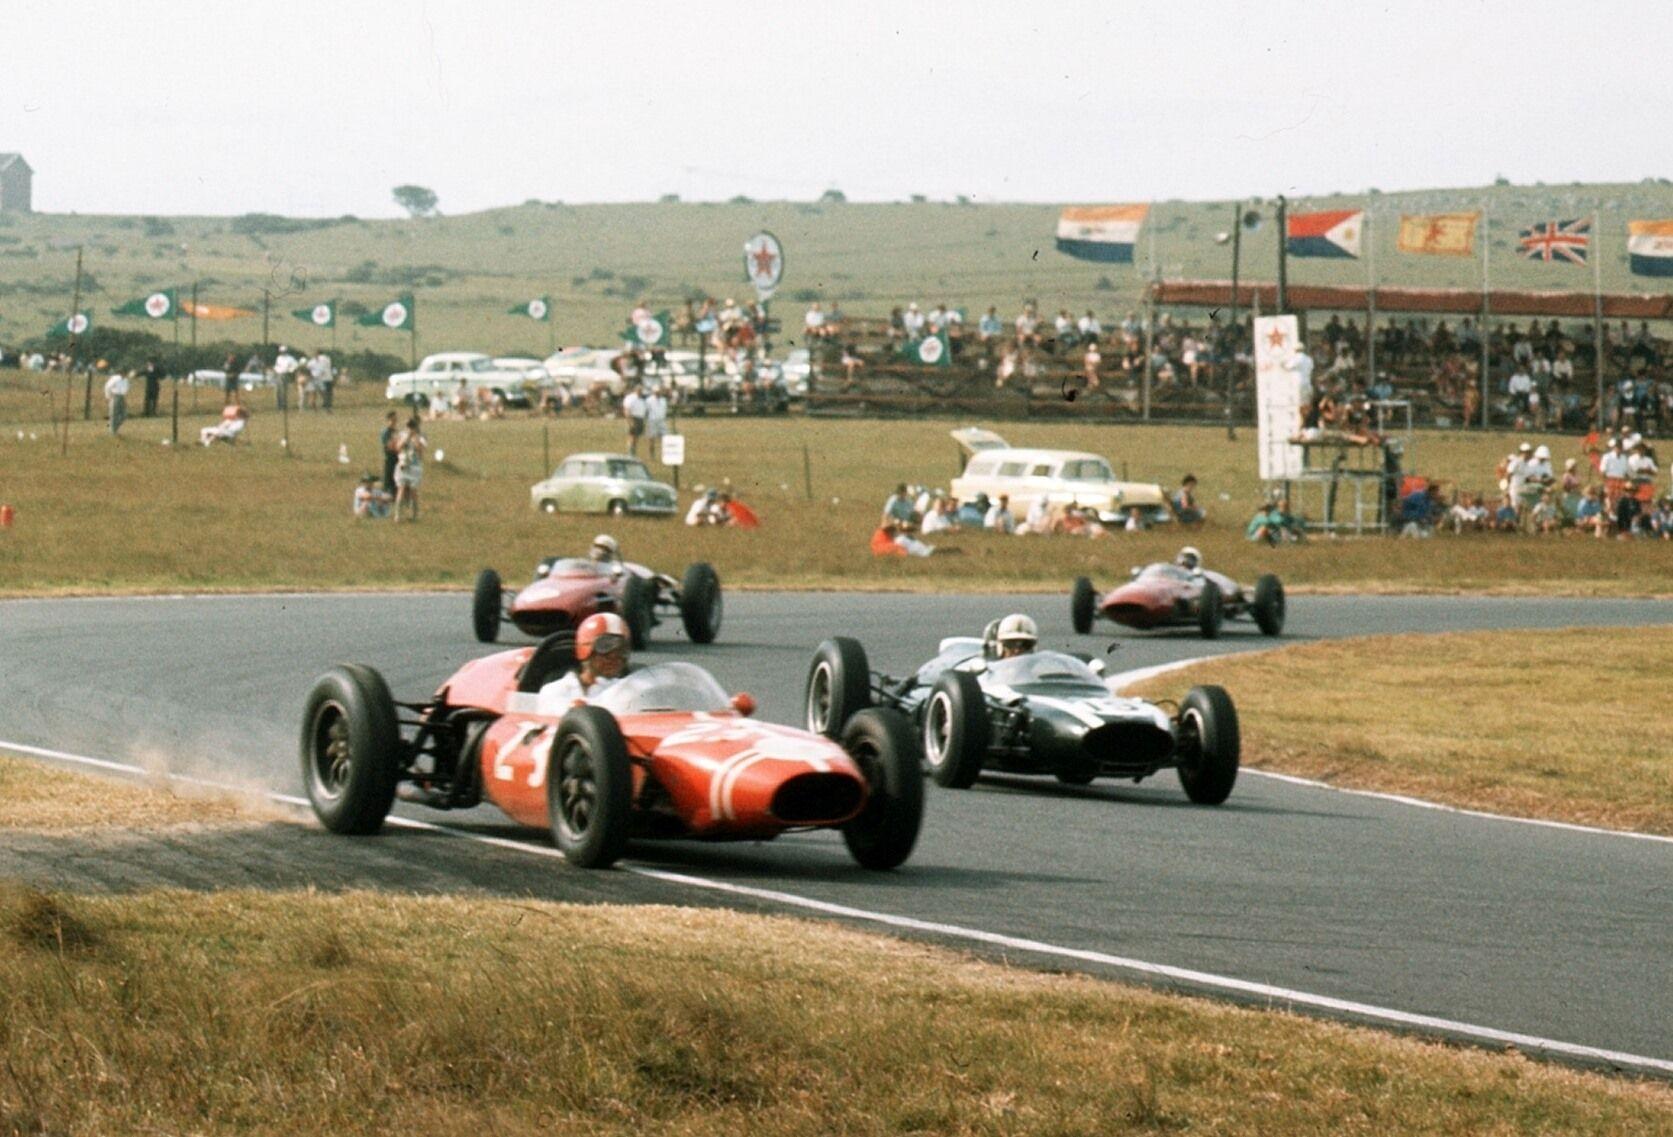 Facebook | Racing, Grand prix, South african